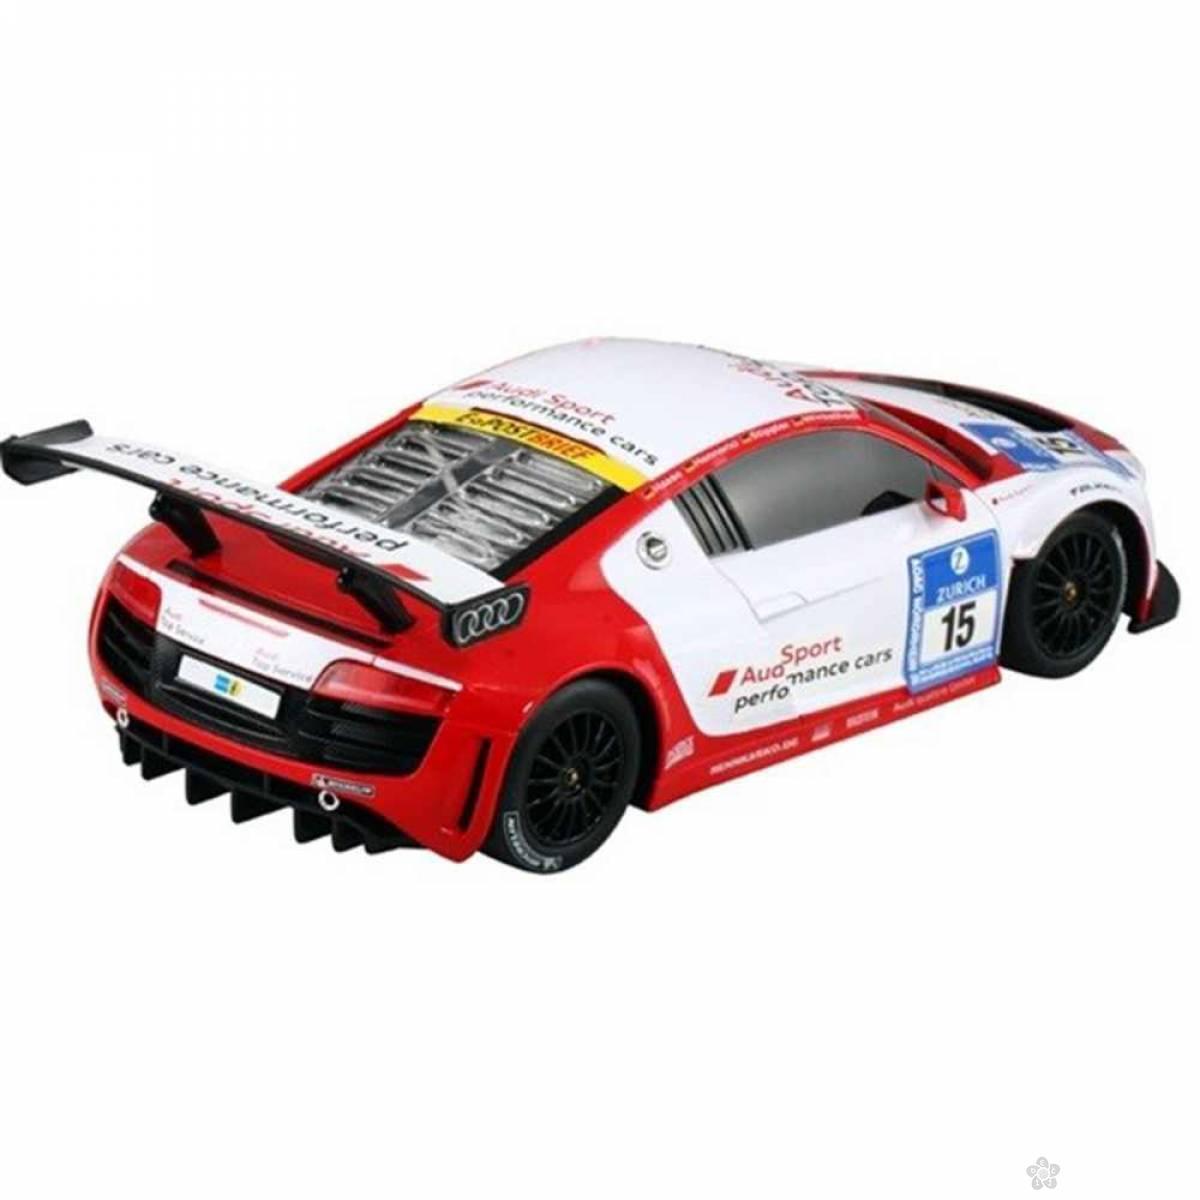 Auto R/C 1:18 Audi R8 LMS